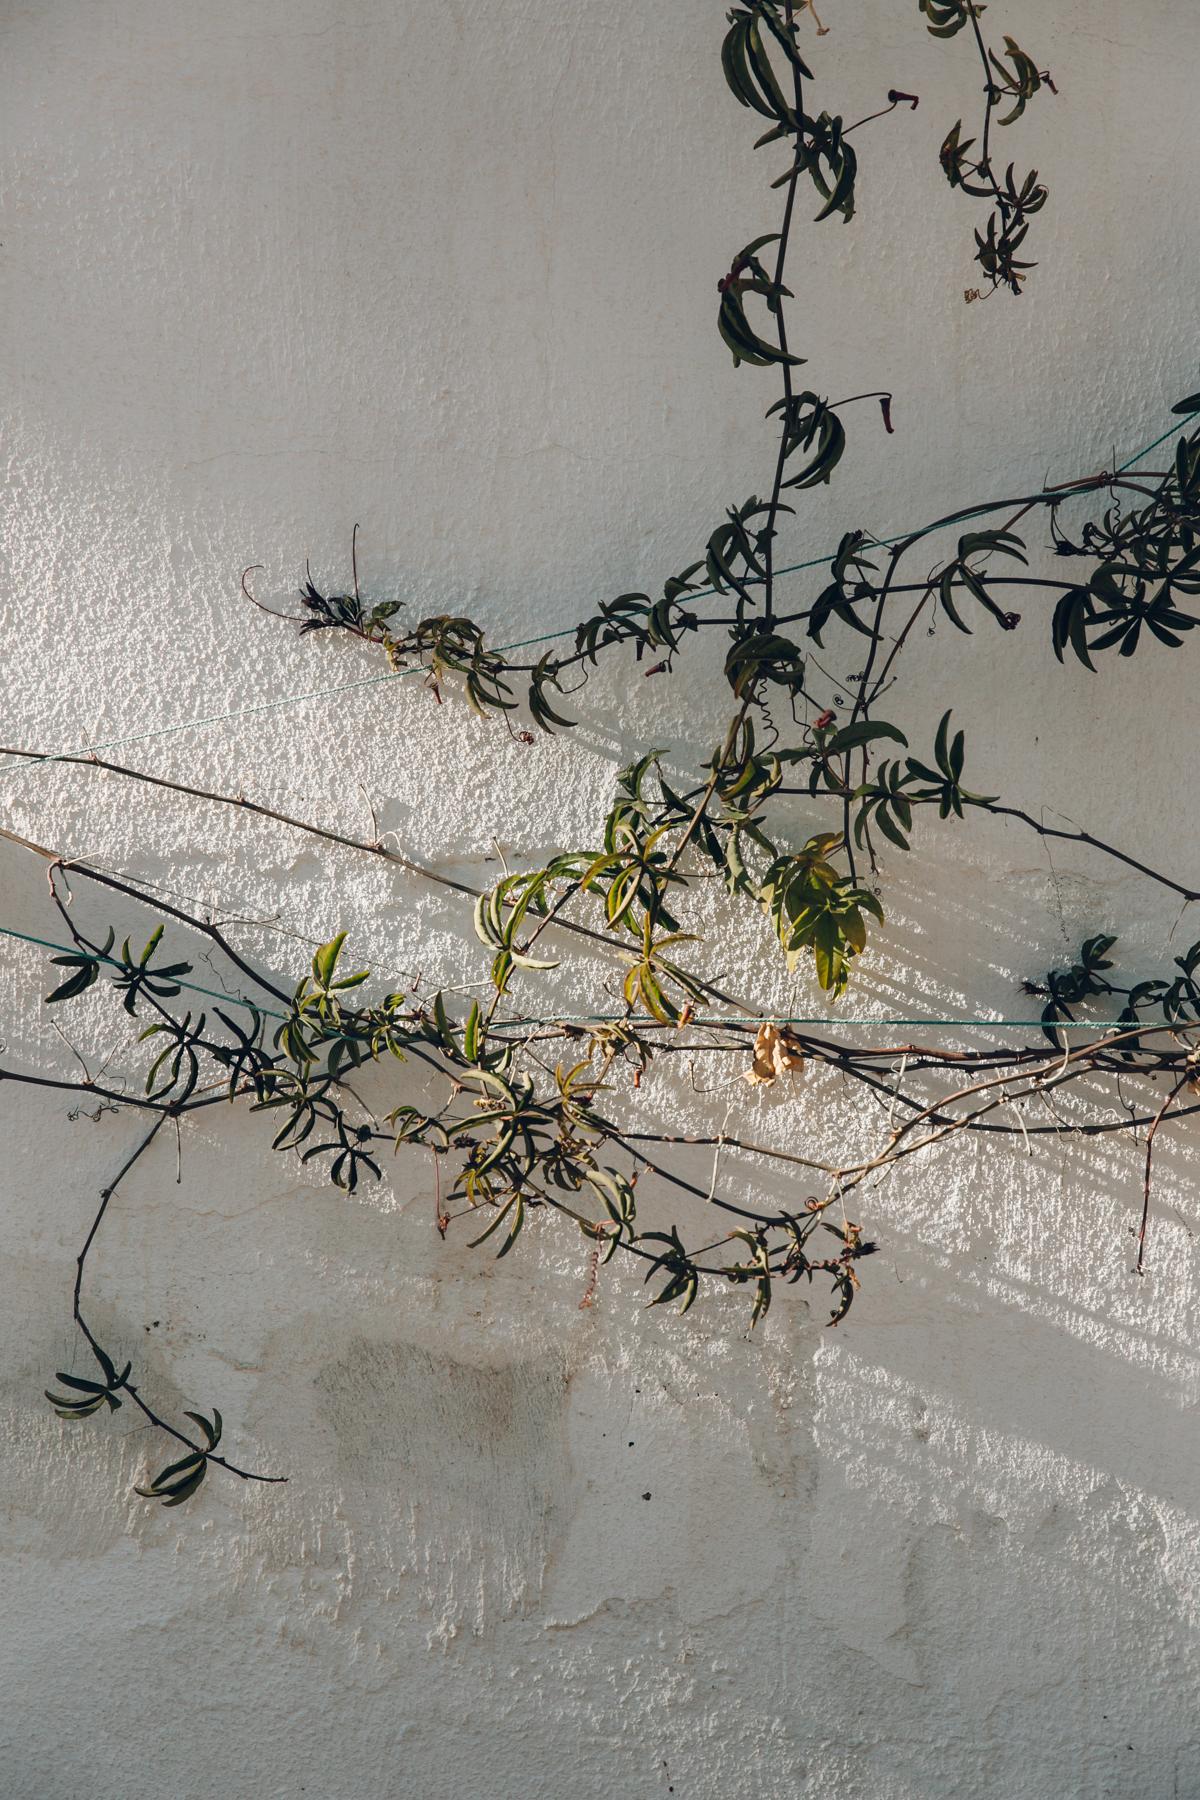 Light falling on passionflower vines.